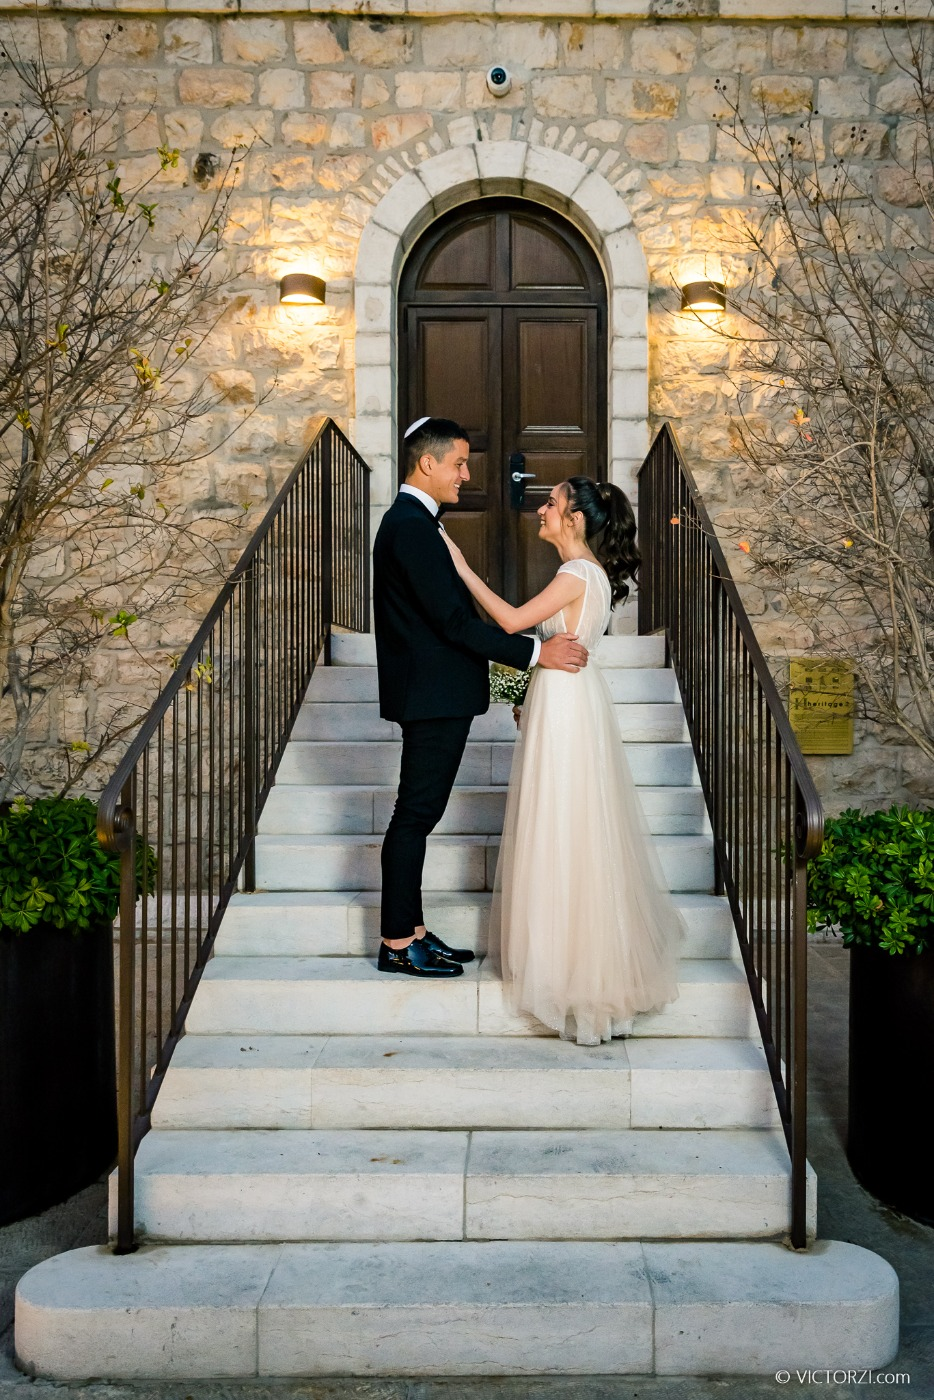 20181209 - Mor & Yoni - The Wedding - VZ